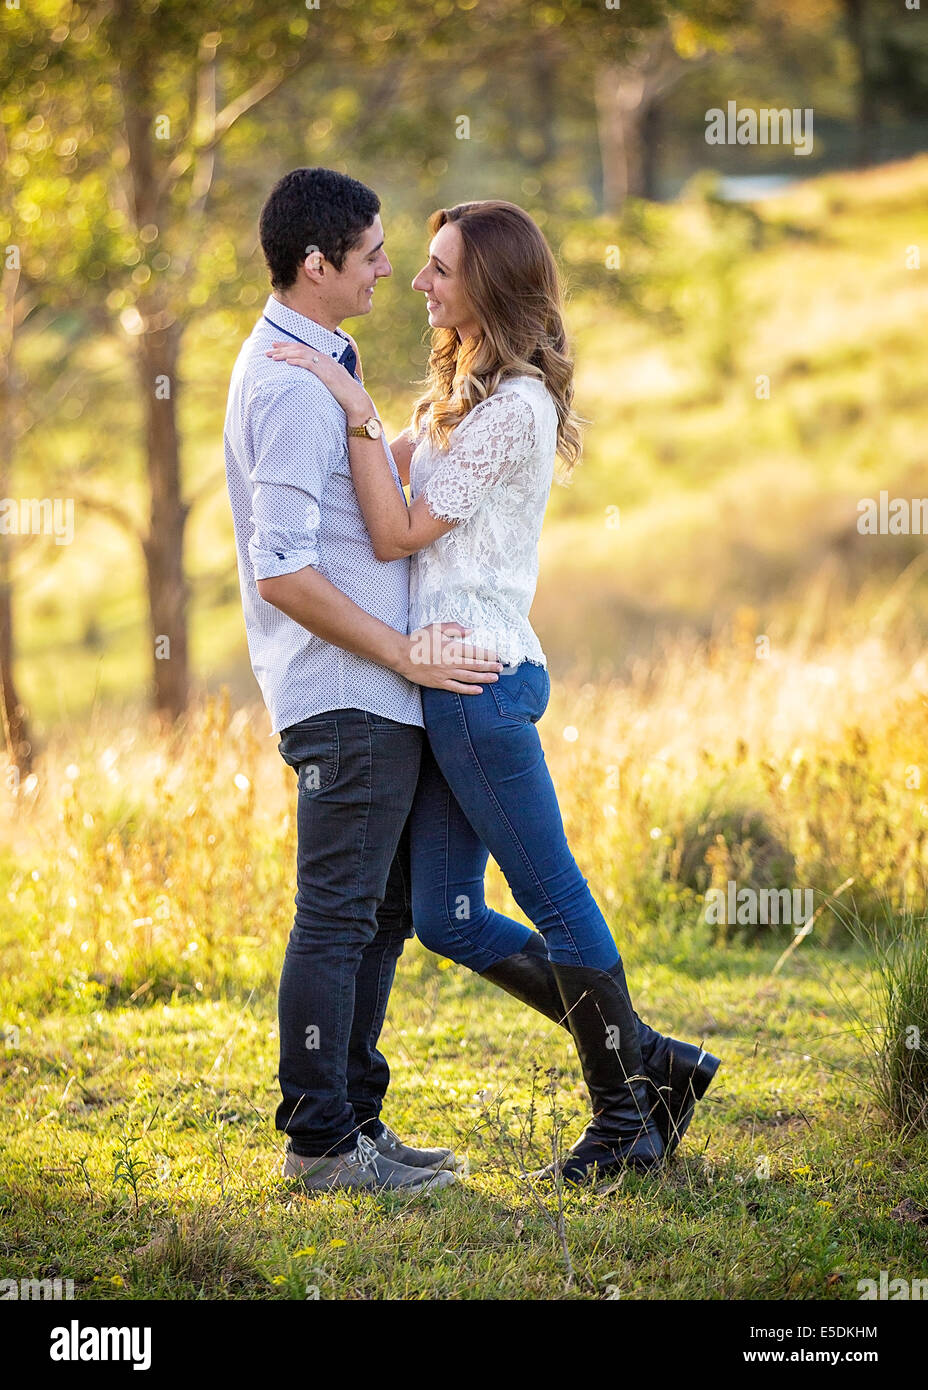 Jeune couple standing in embrasser dans un cadre rural Photo Stock